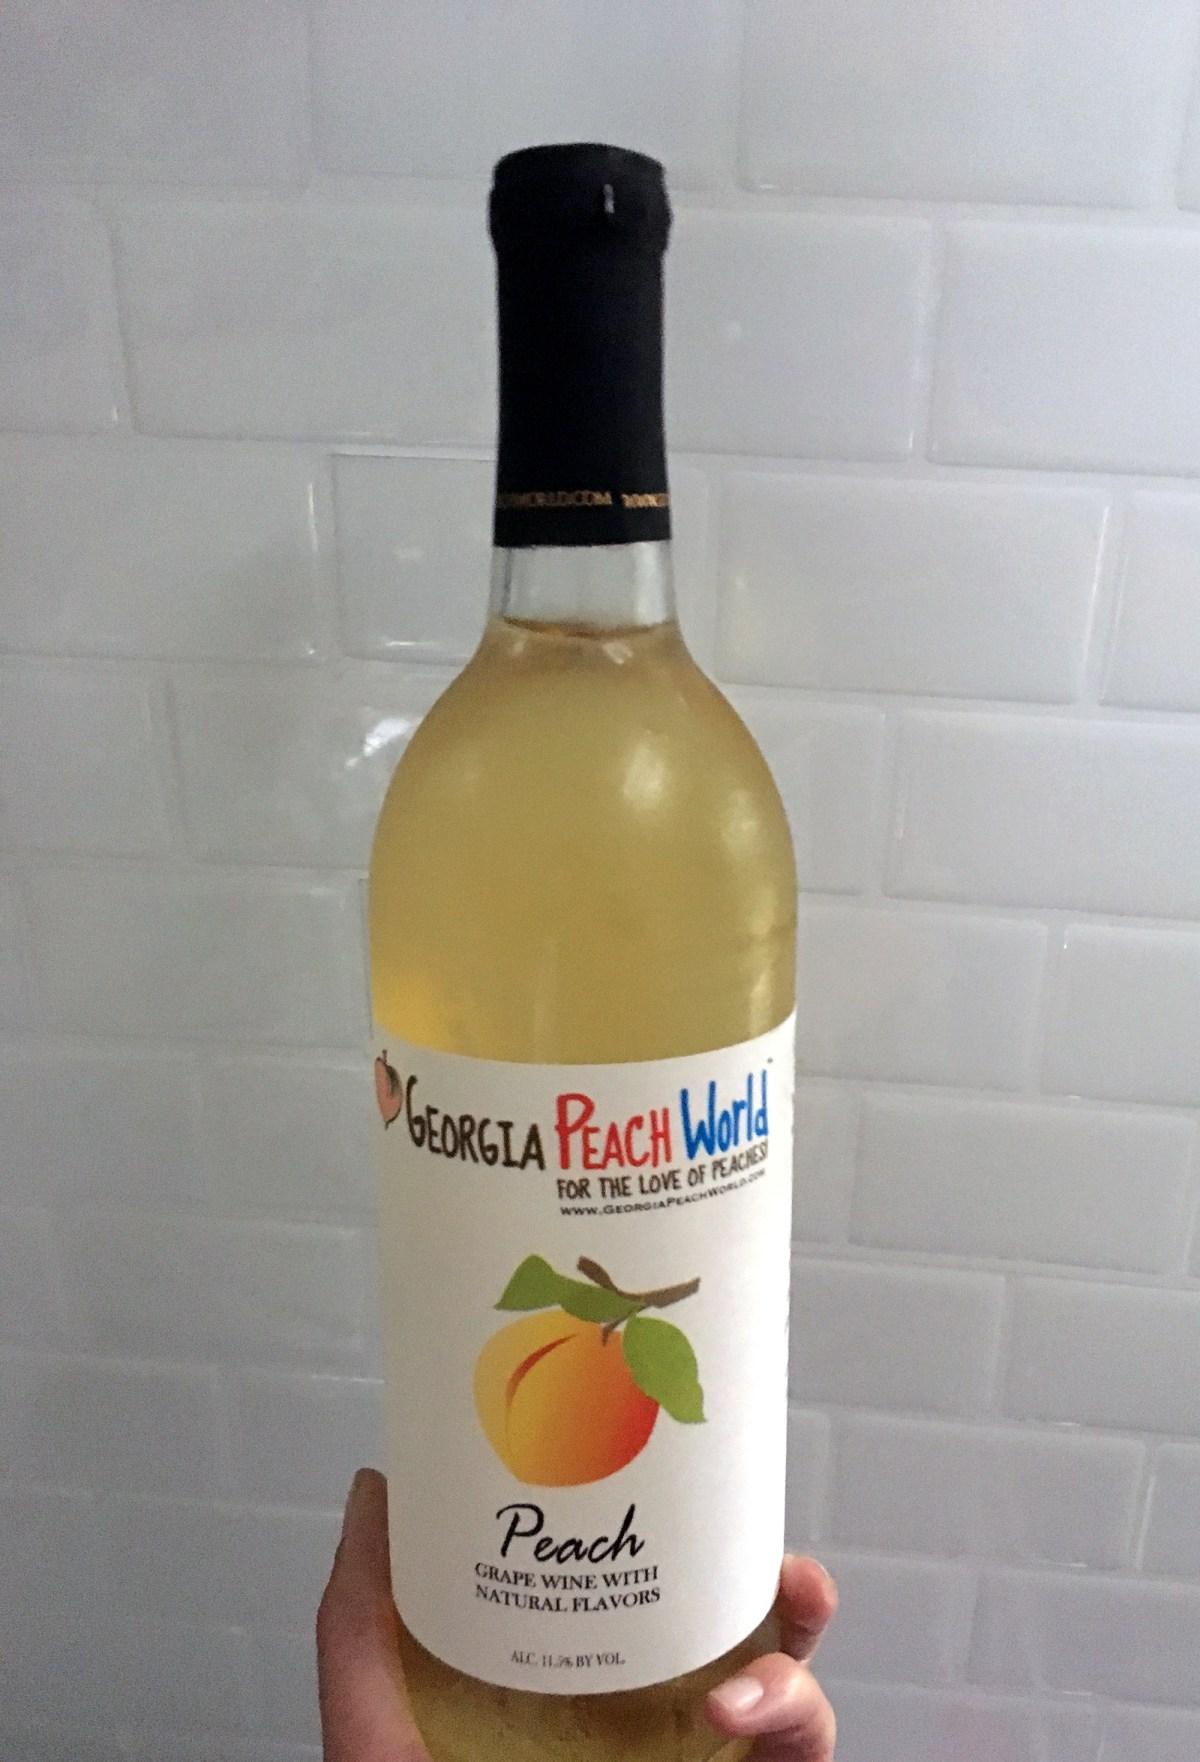 Generic Van Life - Georgia Peach Wine